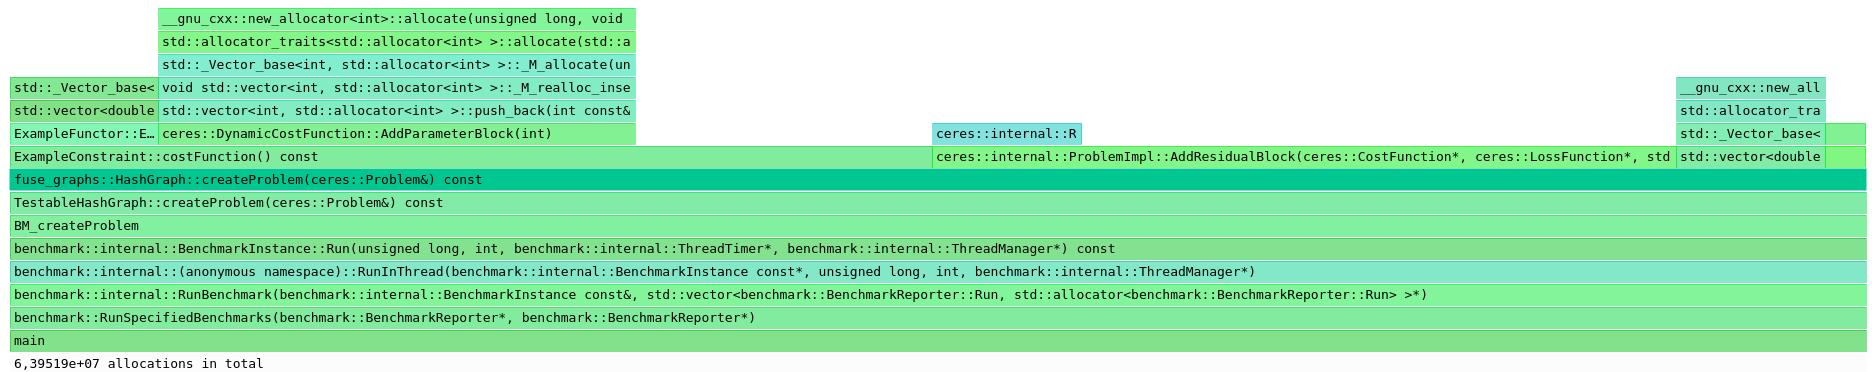 heaptrack-1229416-Screenshot from 2020-12-02 22-16-03